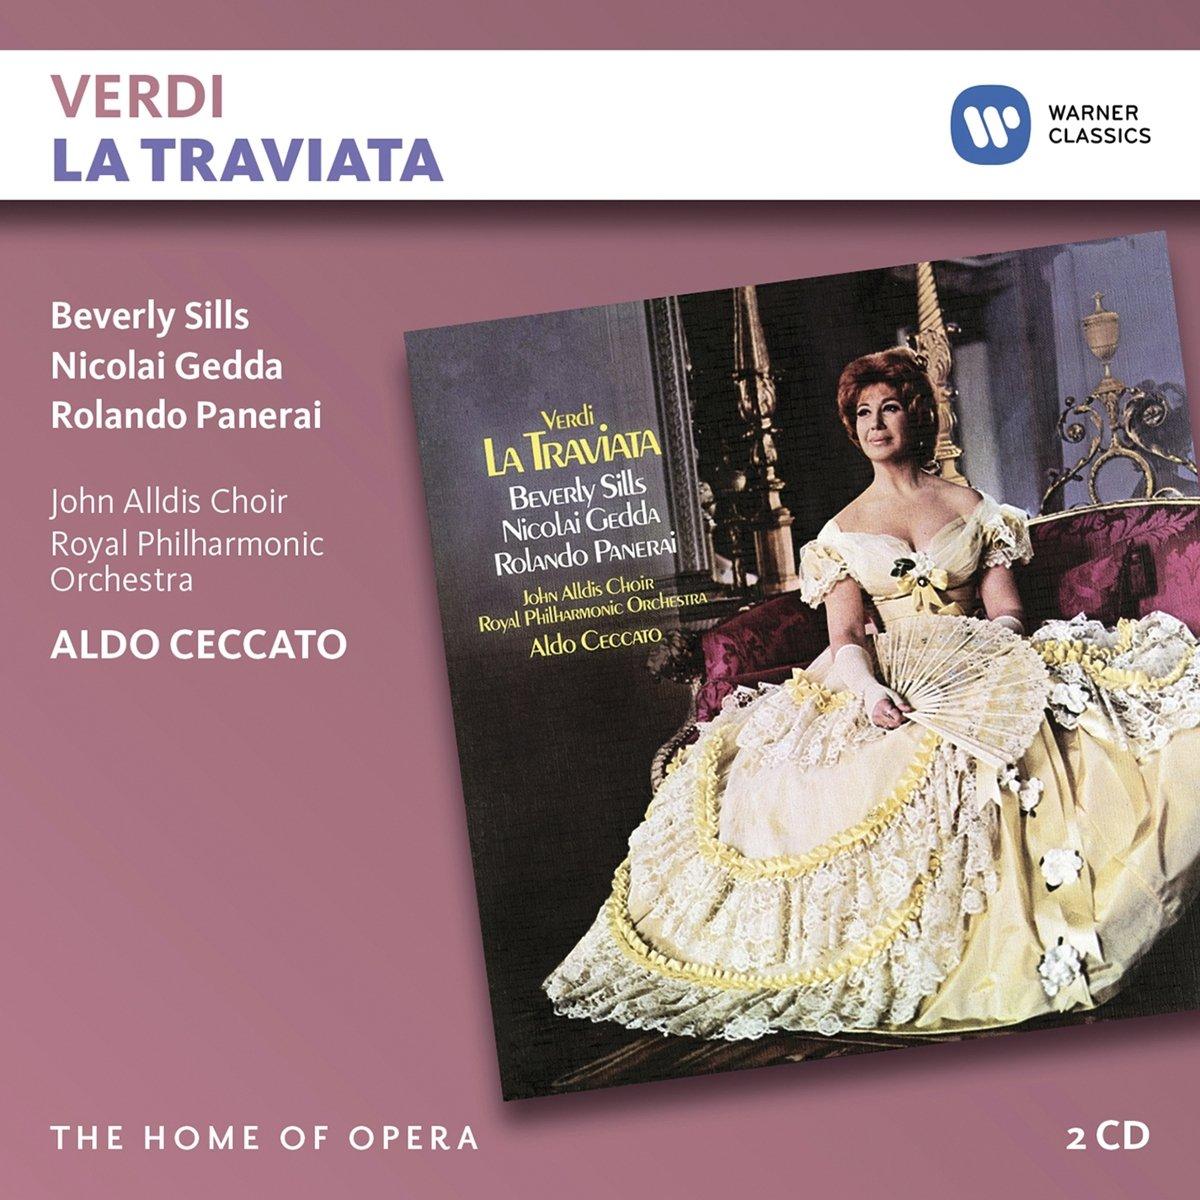 CD : Beverly Sills - Verdi: La Traviata (2PC)